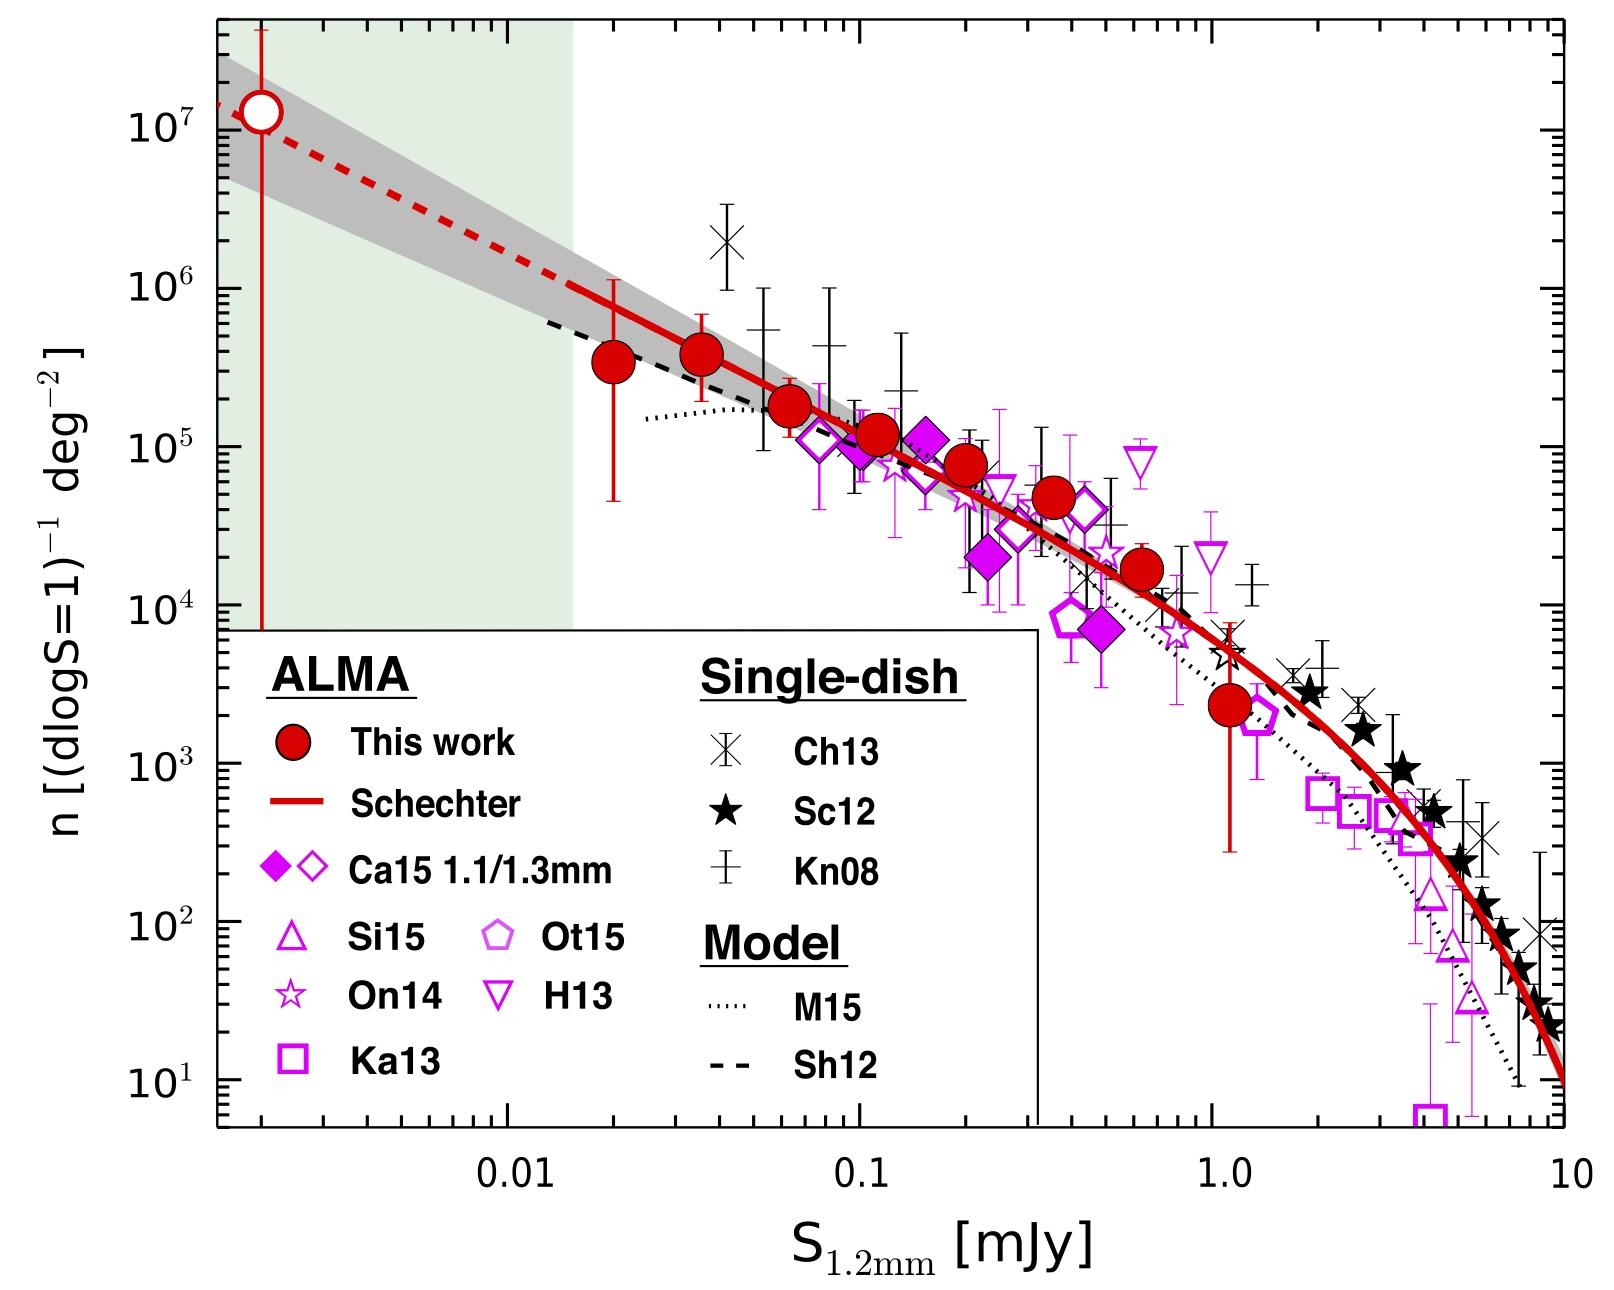 alma-science-fig5-cat1